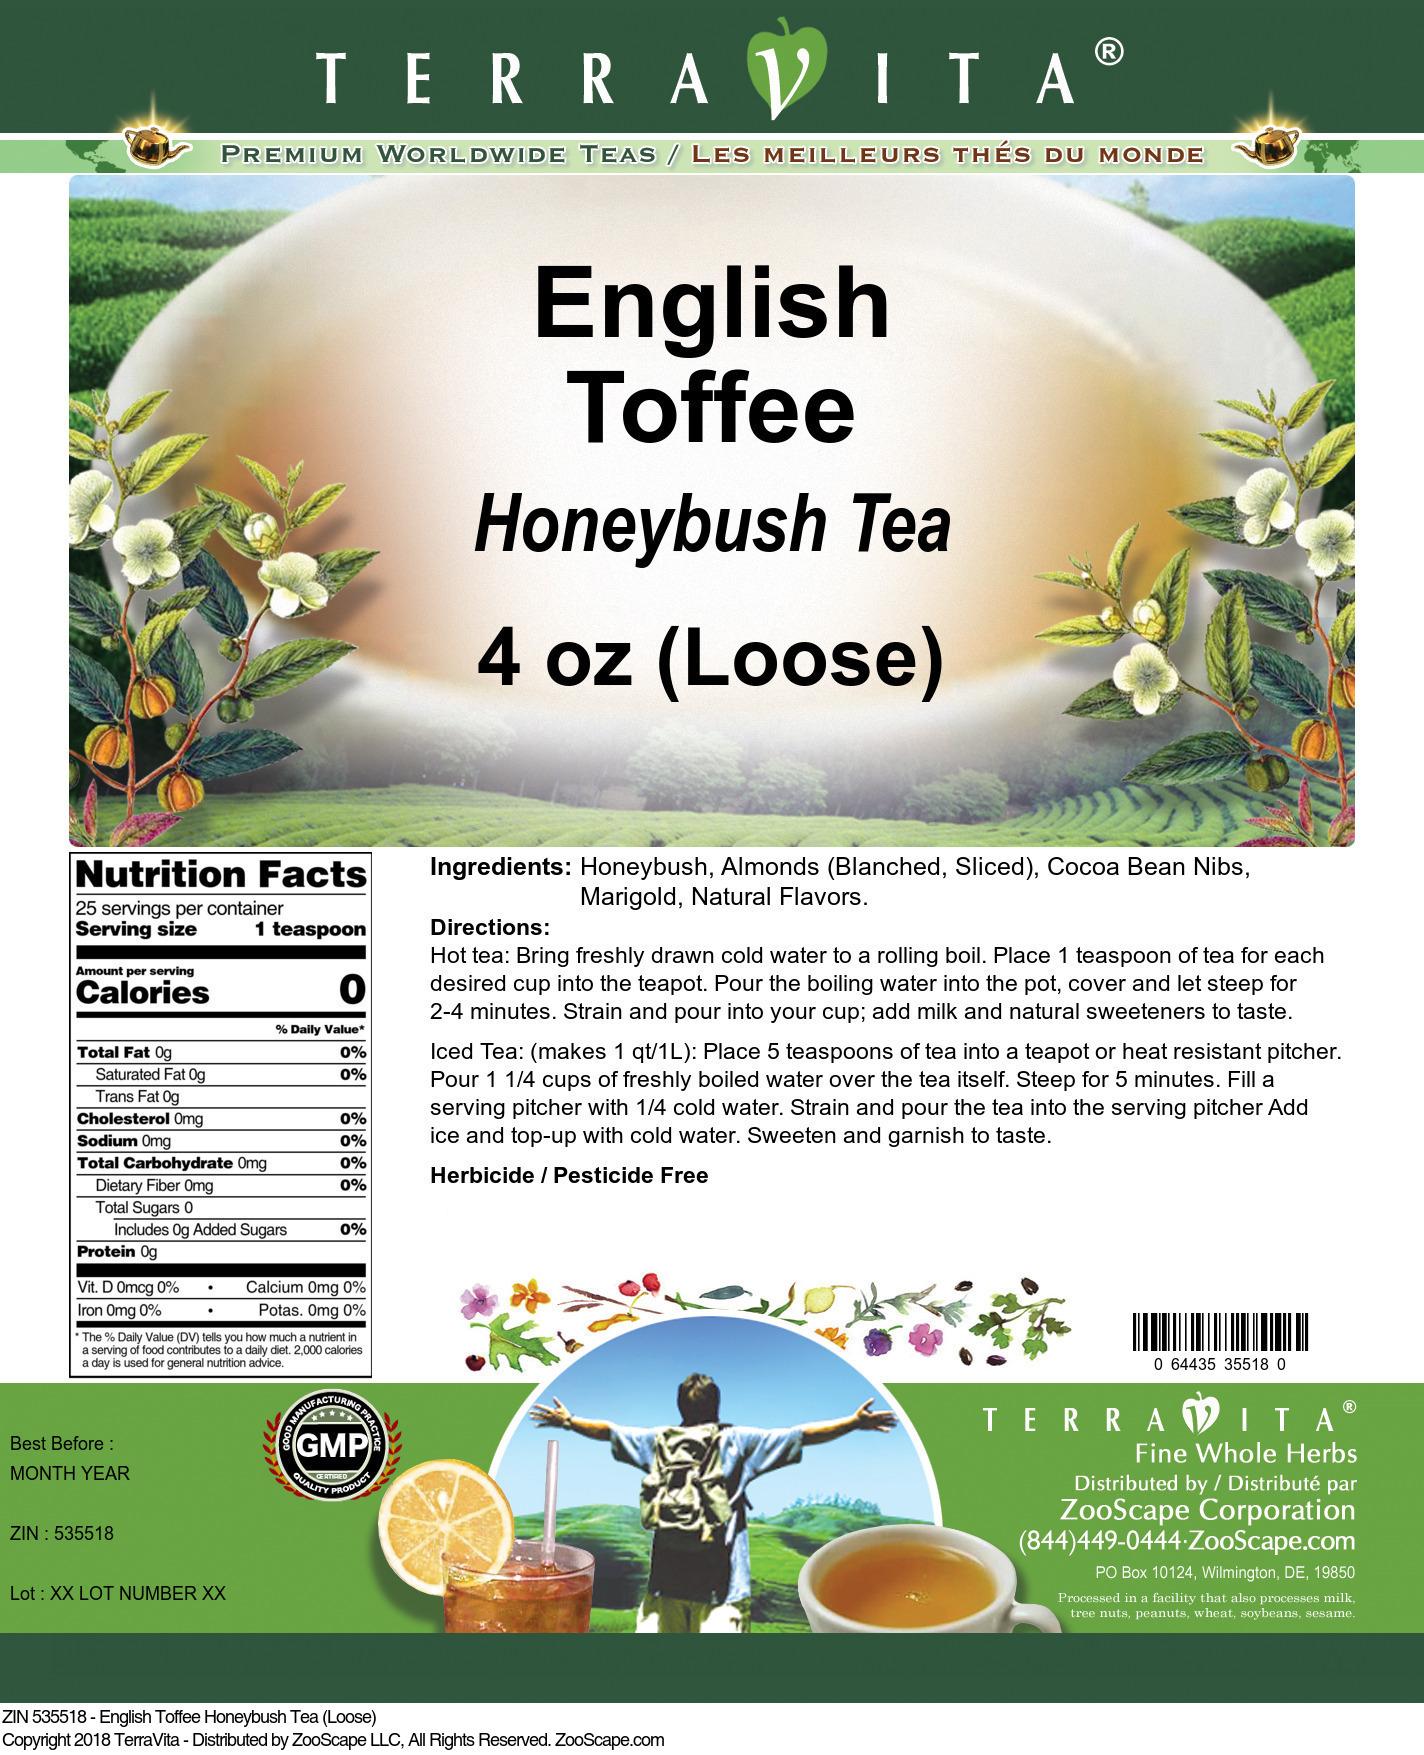 English Toffee Honeybush Tea (Loose)